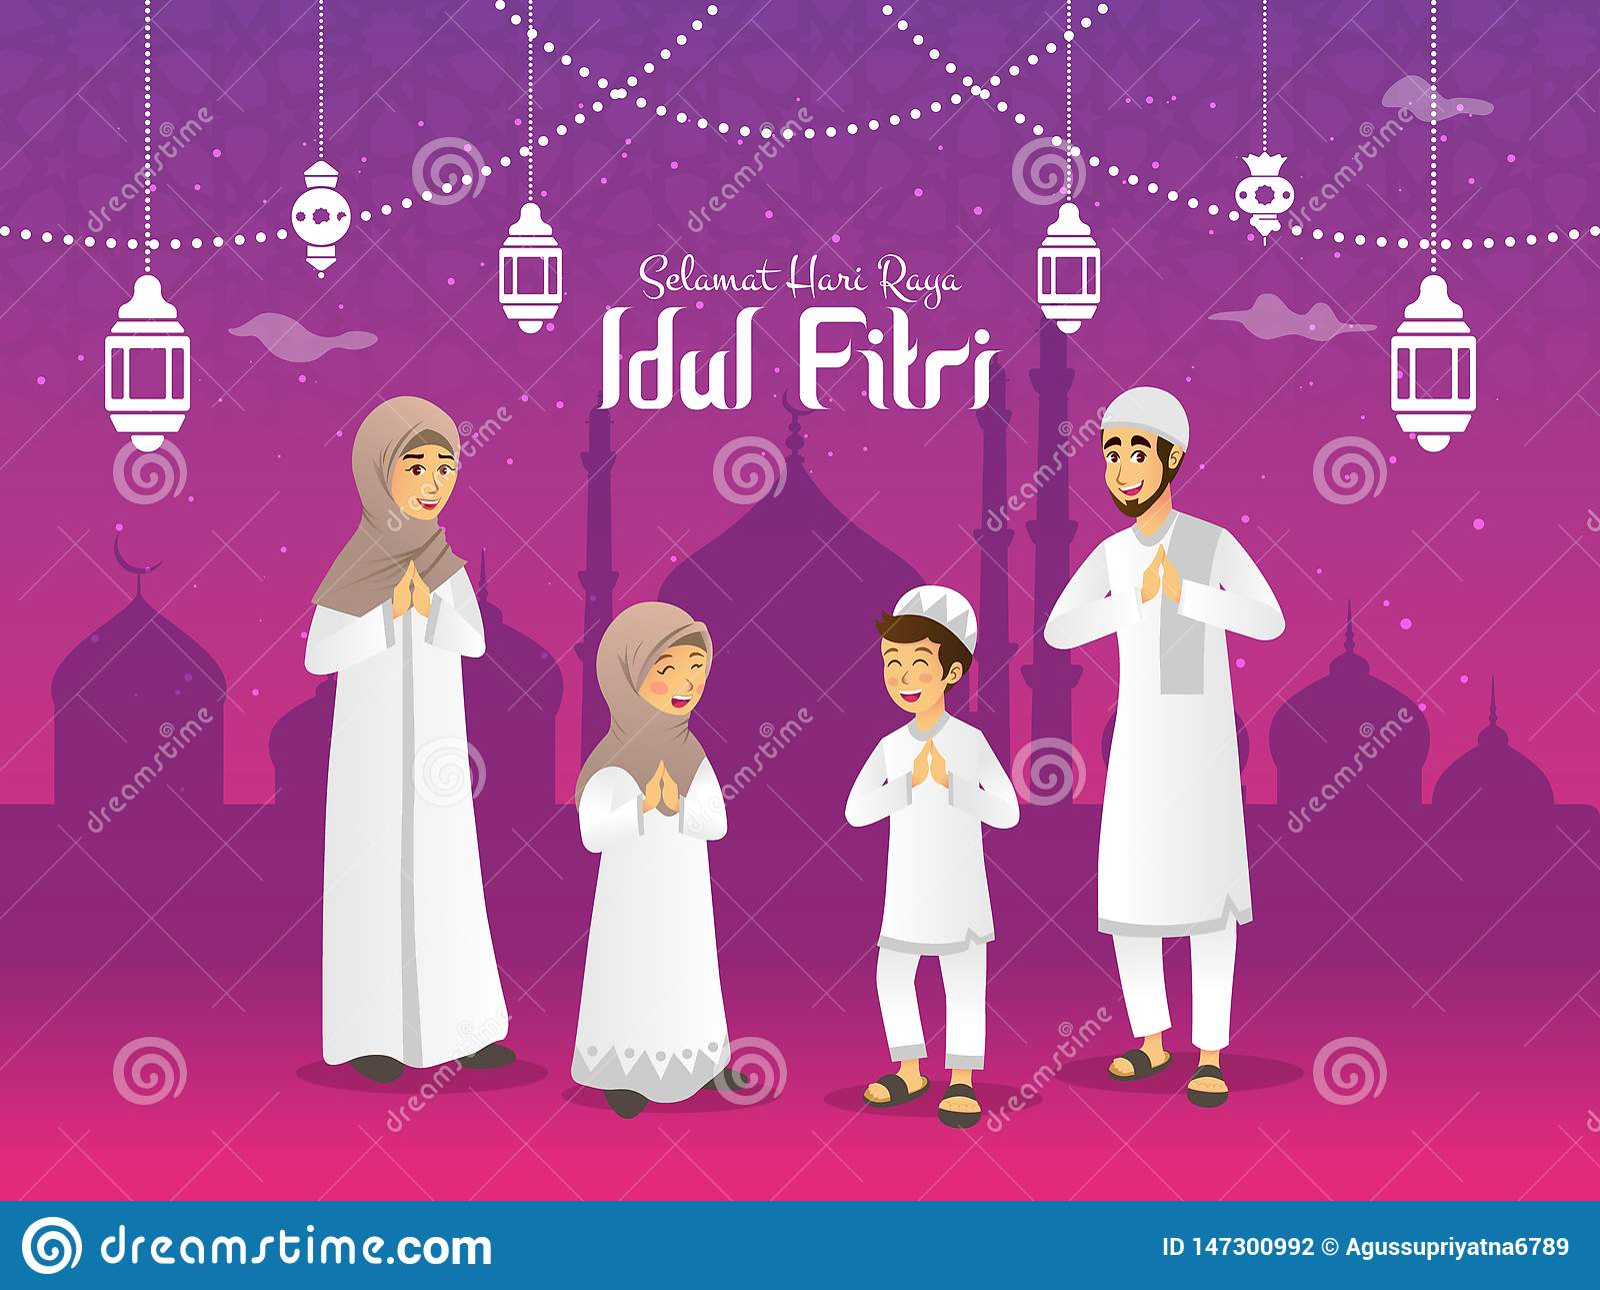 Idul Fitri Stock Illustrations 1 656 Idul Fitri Stock Illustrations Vectors Clipart Dreamstime